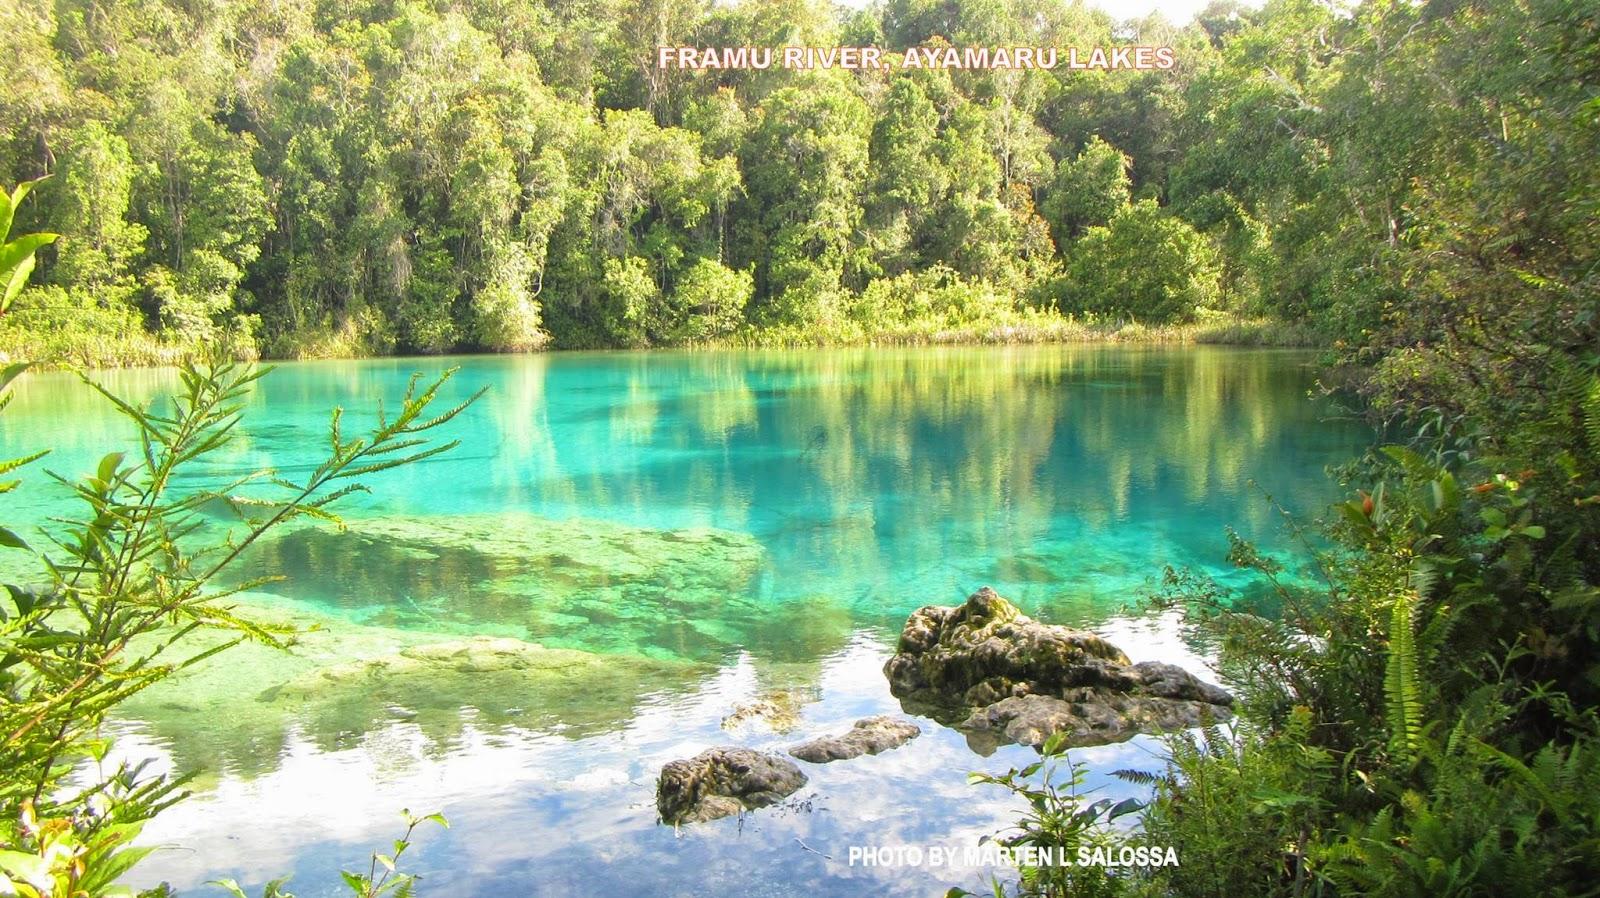 Danau Ayamaru, Keindahan Lain di Tanah Papua, Beningnya Bak Cermin!